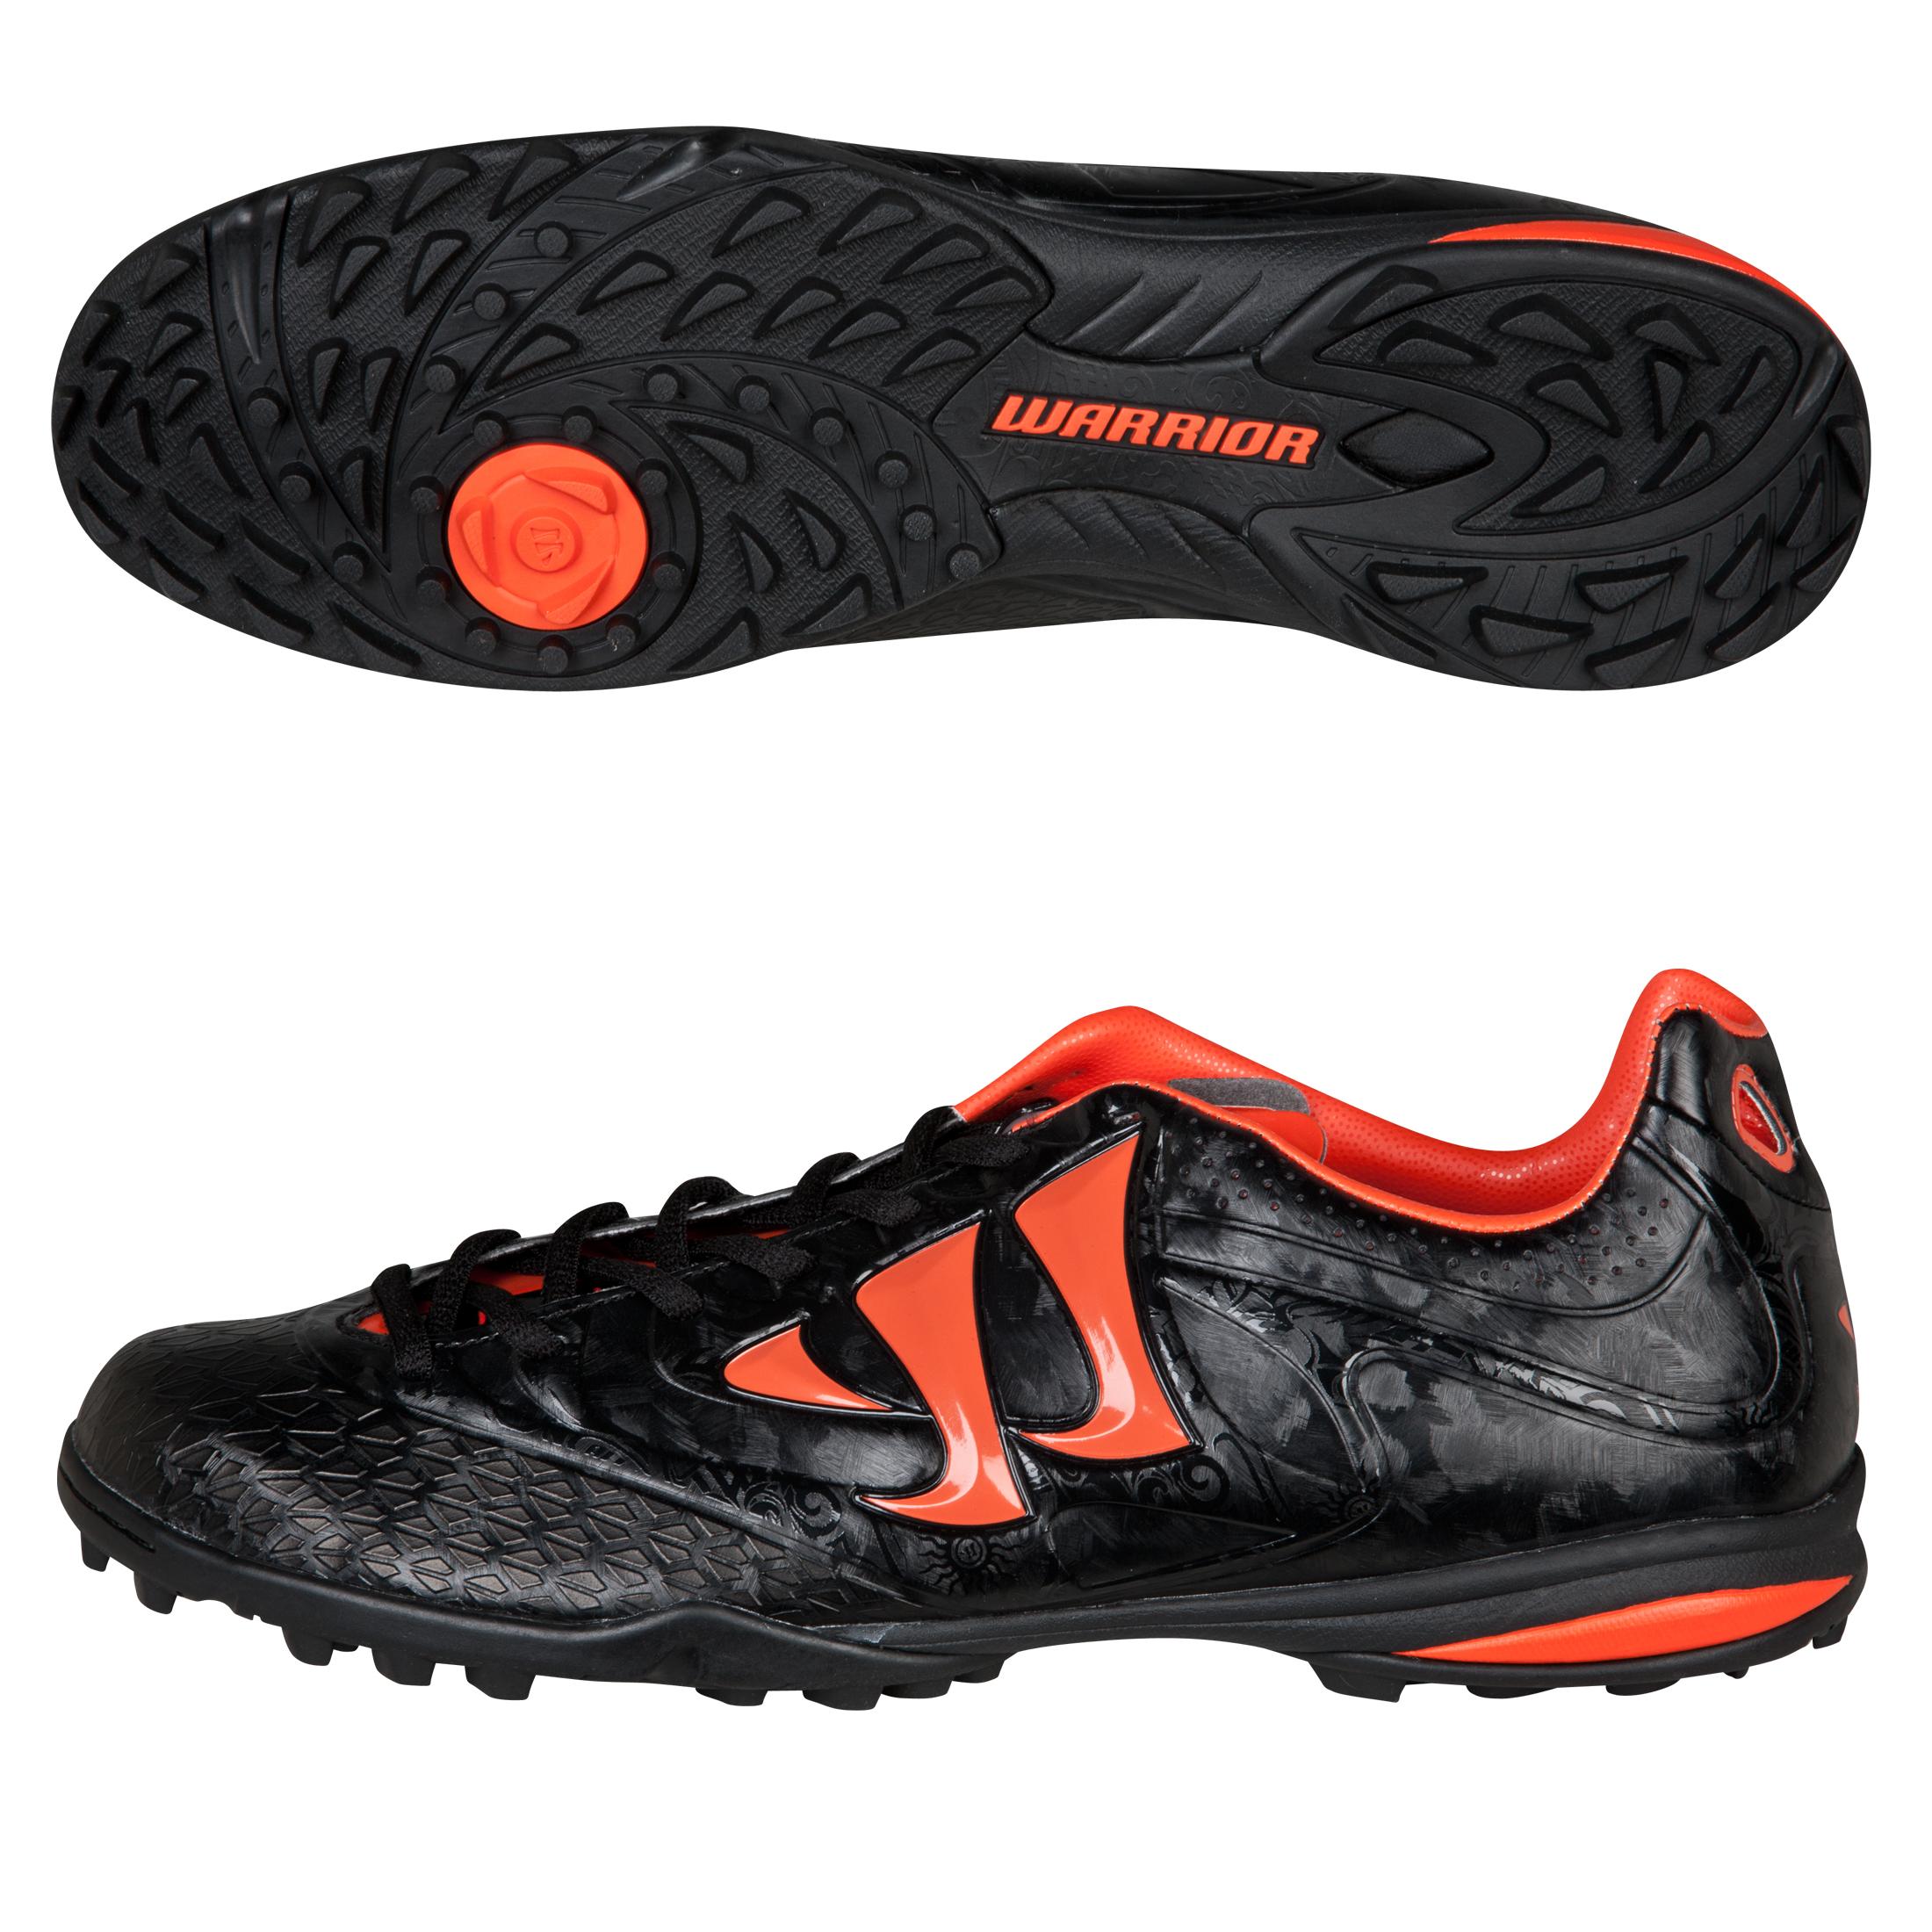 Warrior Sports Skreamer Combat Astroturf Trainers - Black/Spicy Orange